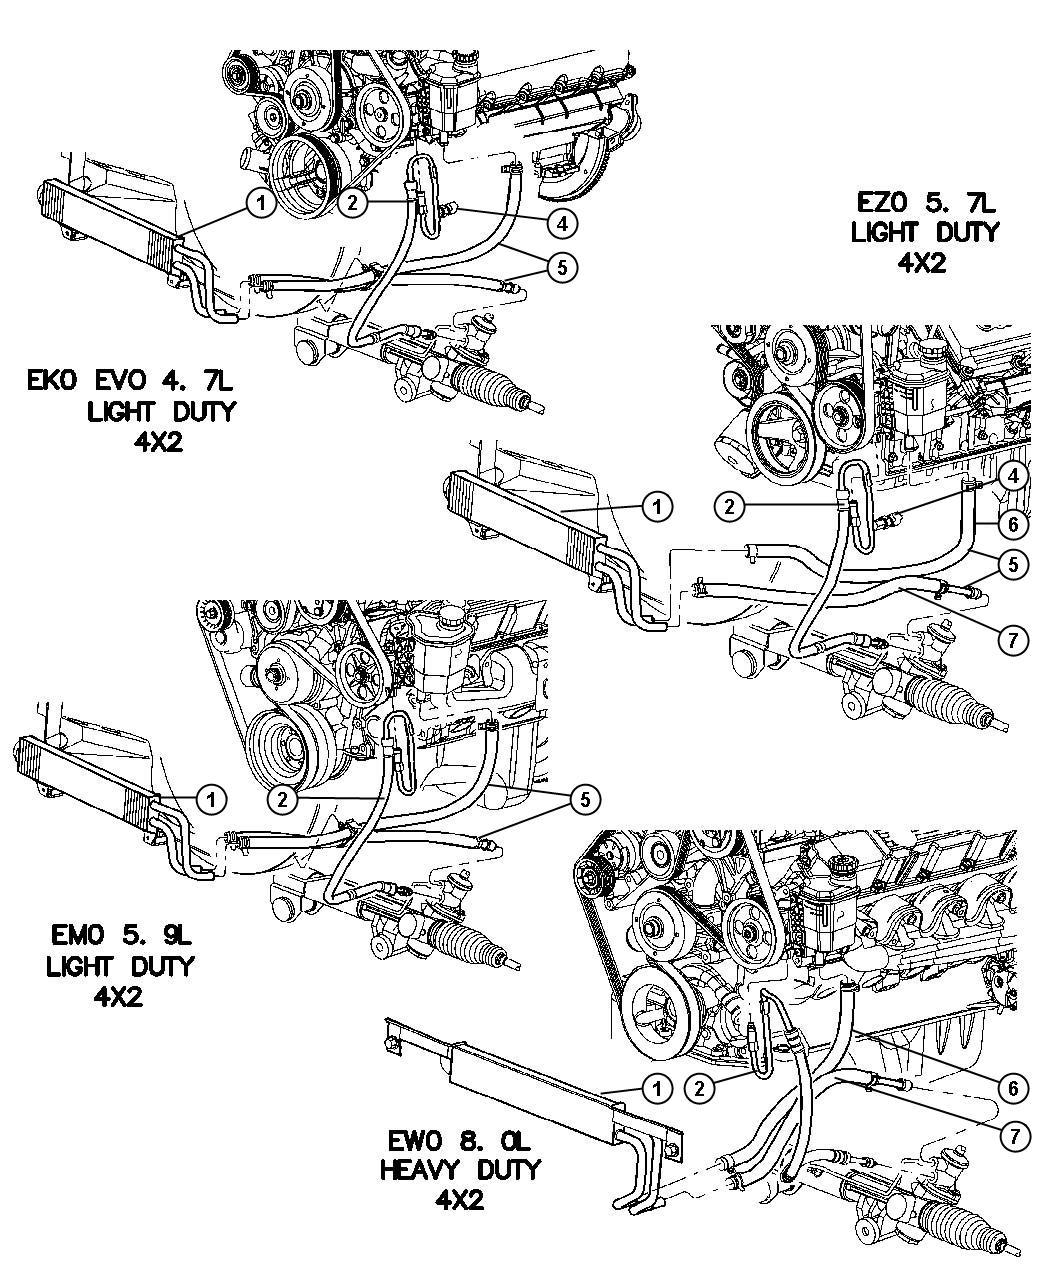 Dodge Ram Hoses Power Steering 2 Wheel Drive